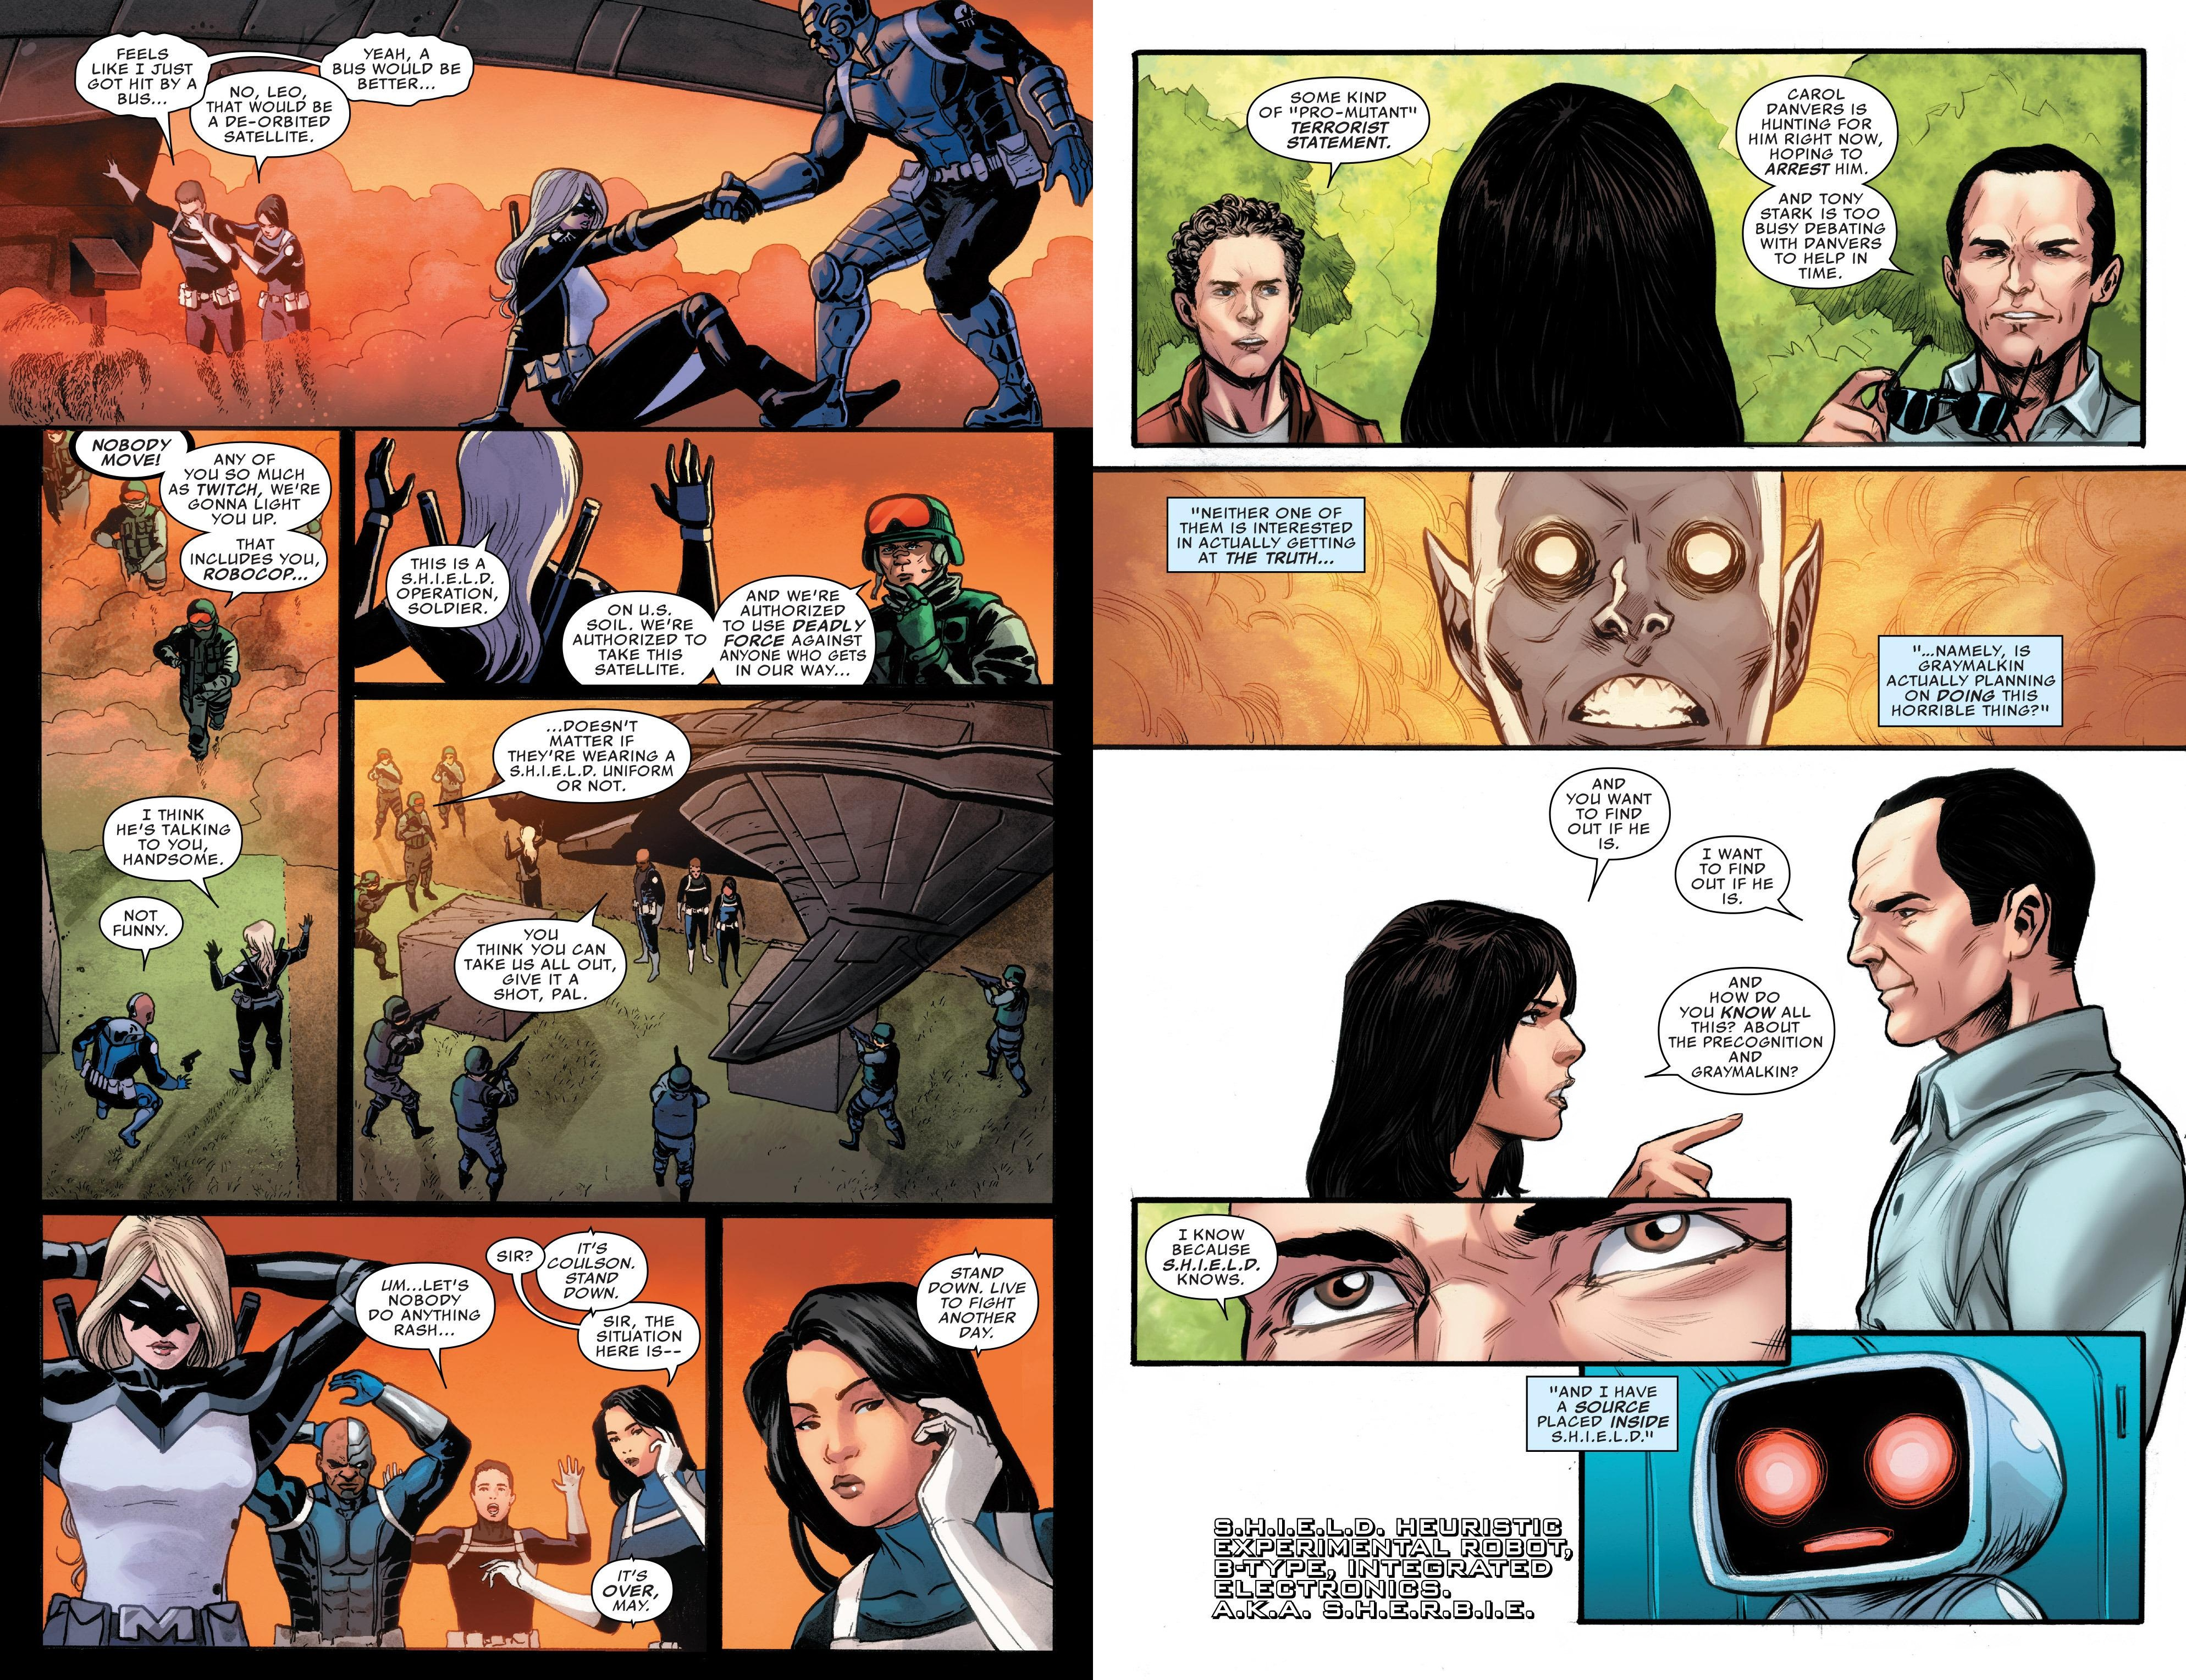 Agents of S.H.I.E.L.D Under New Management review